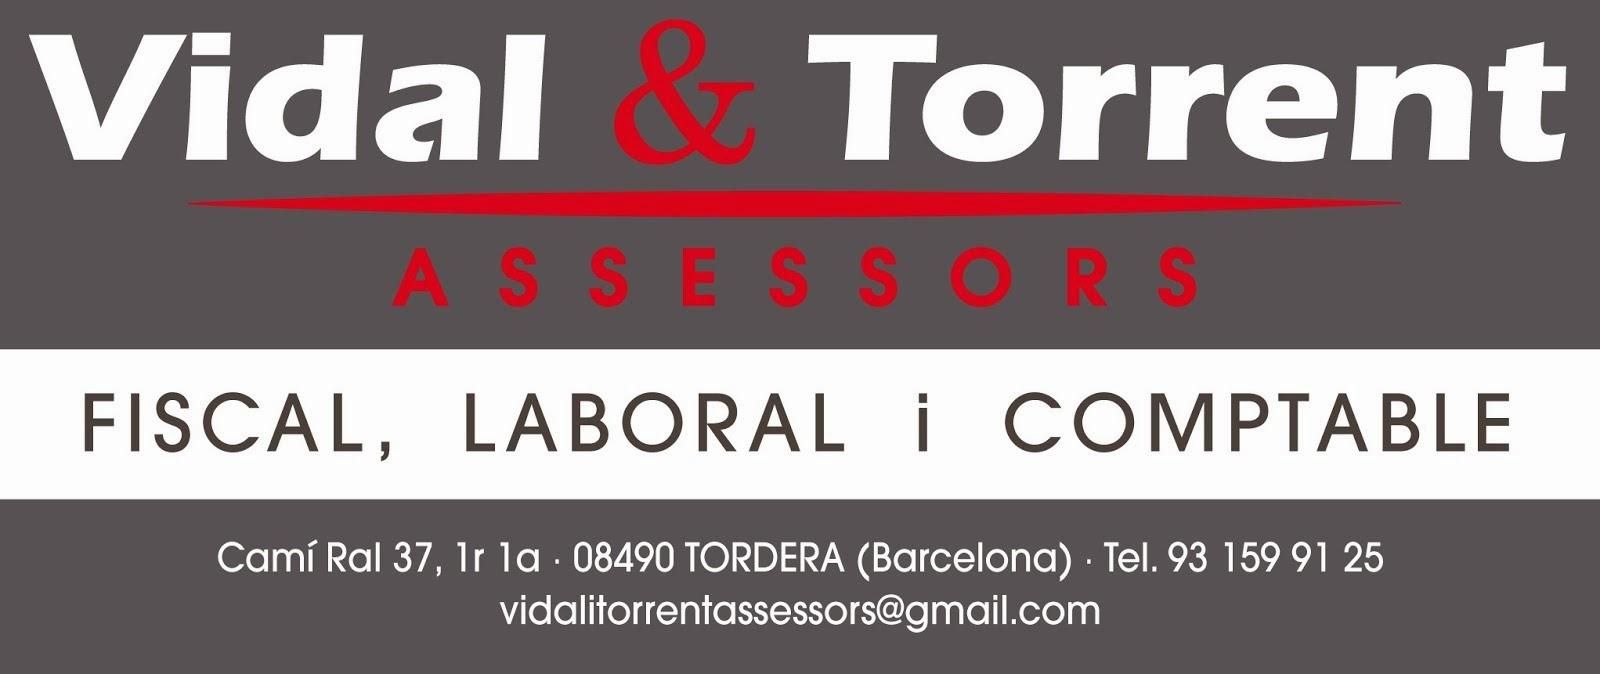 Vidal & Torrent